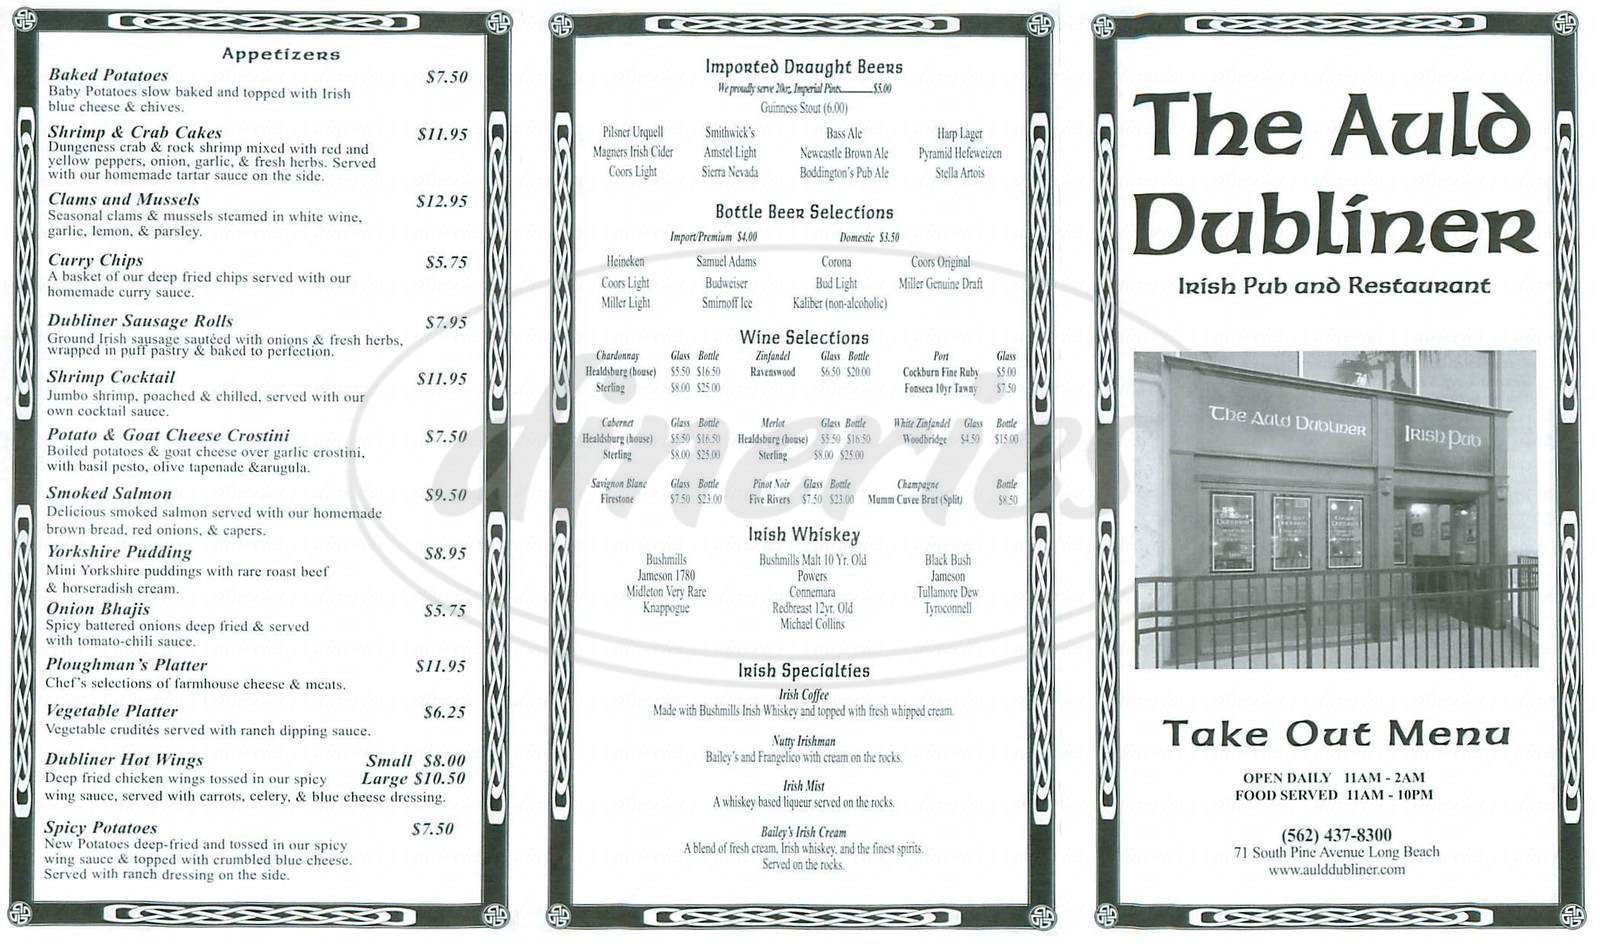 menu for The Auld Dubliner